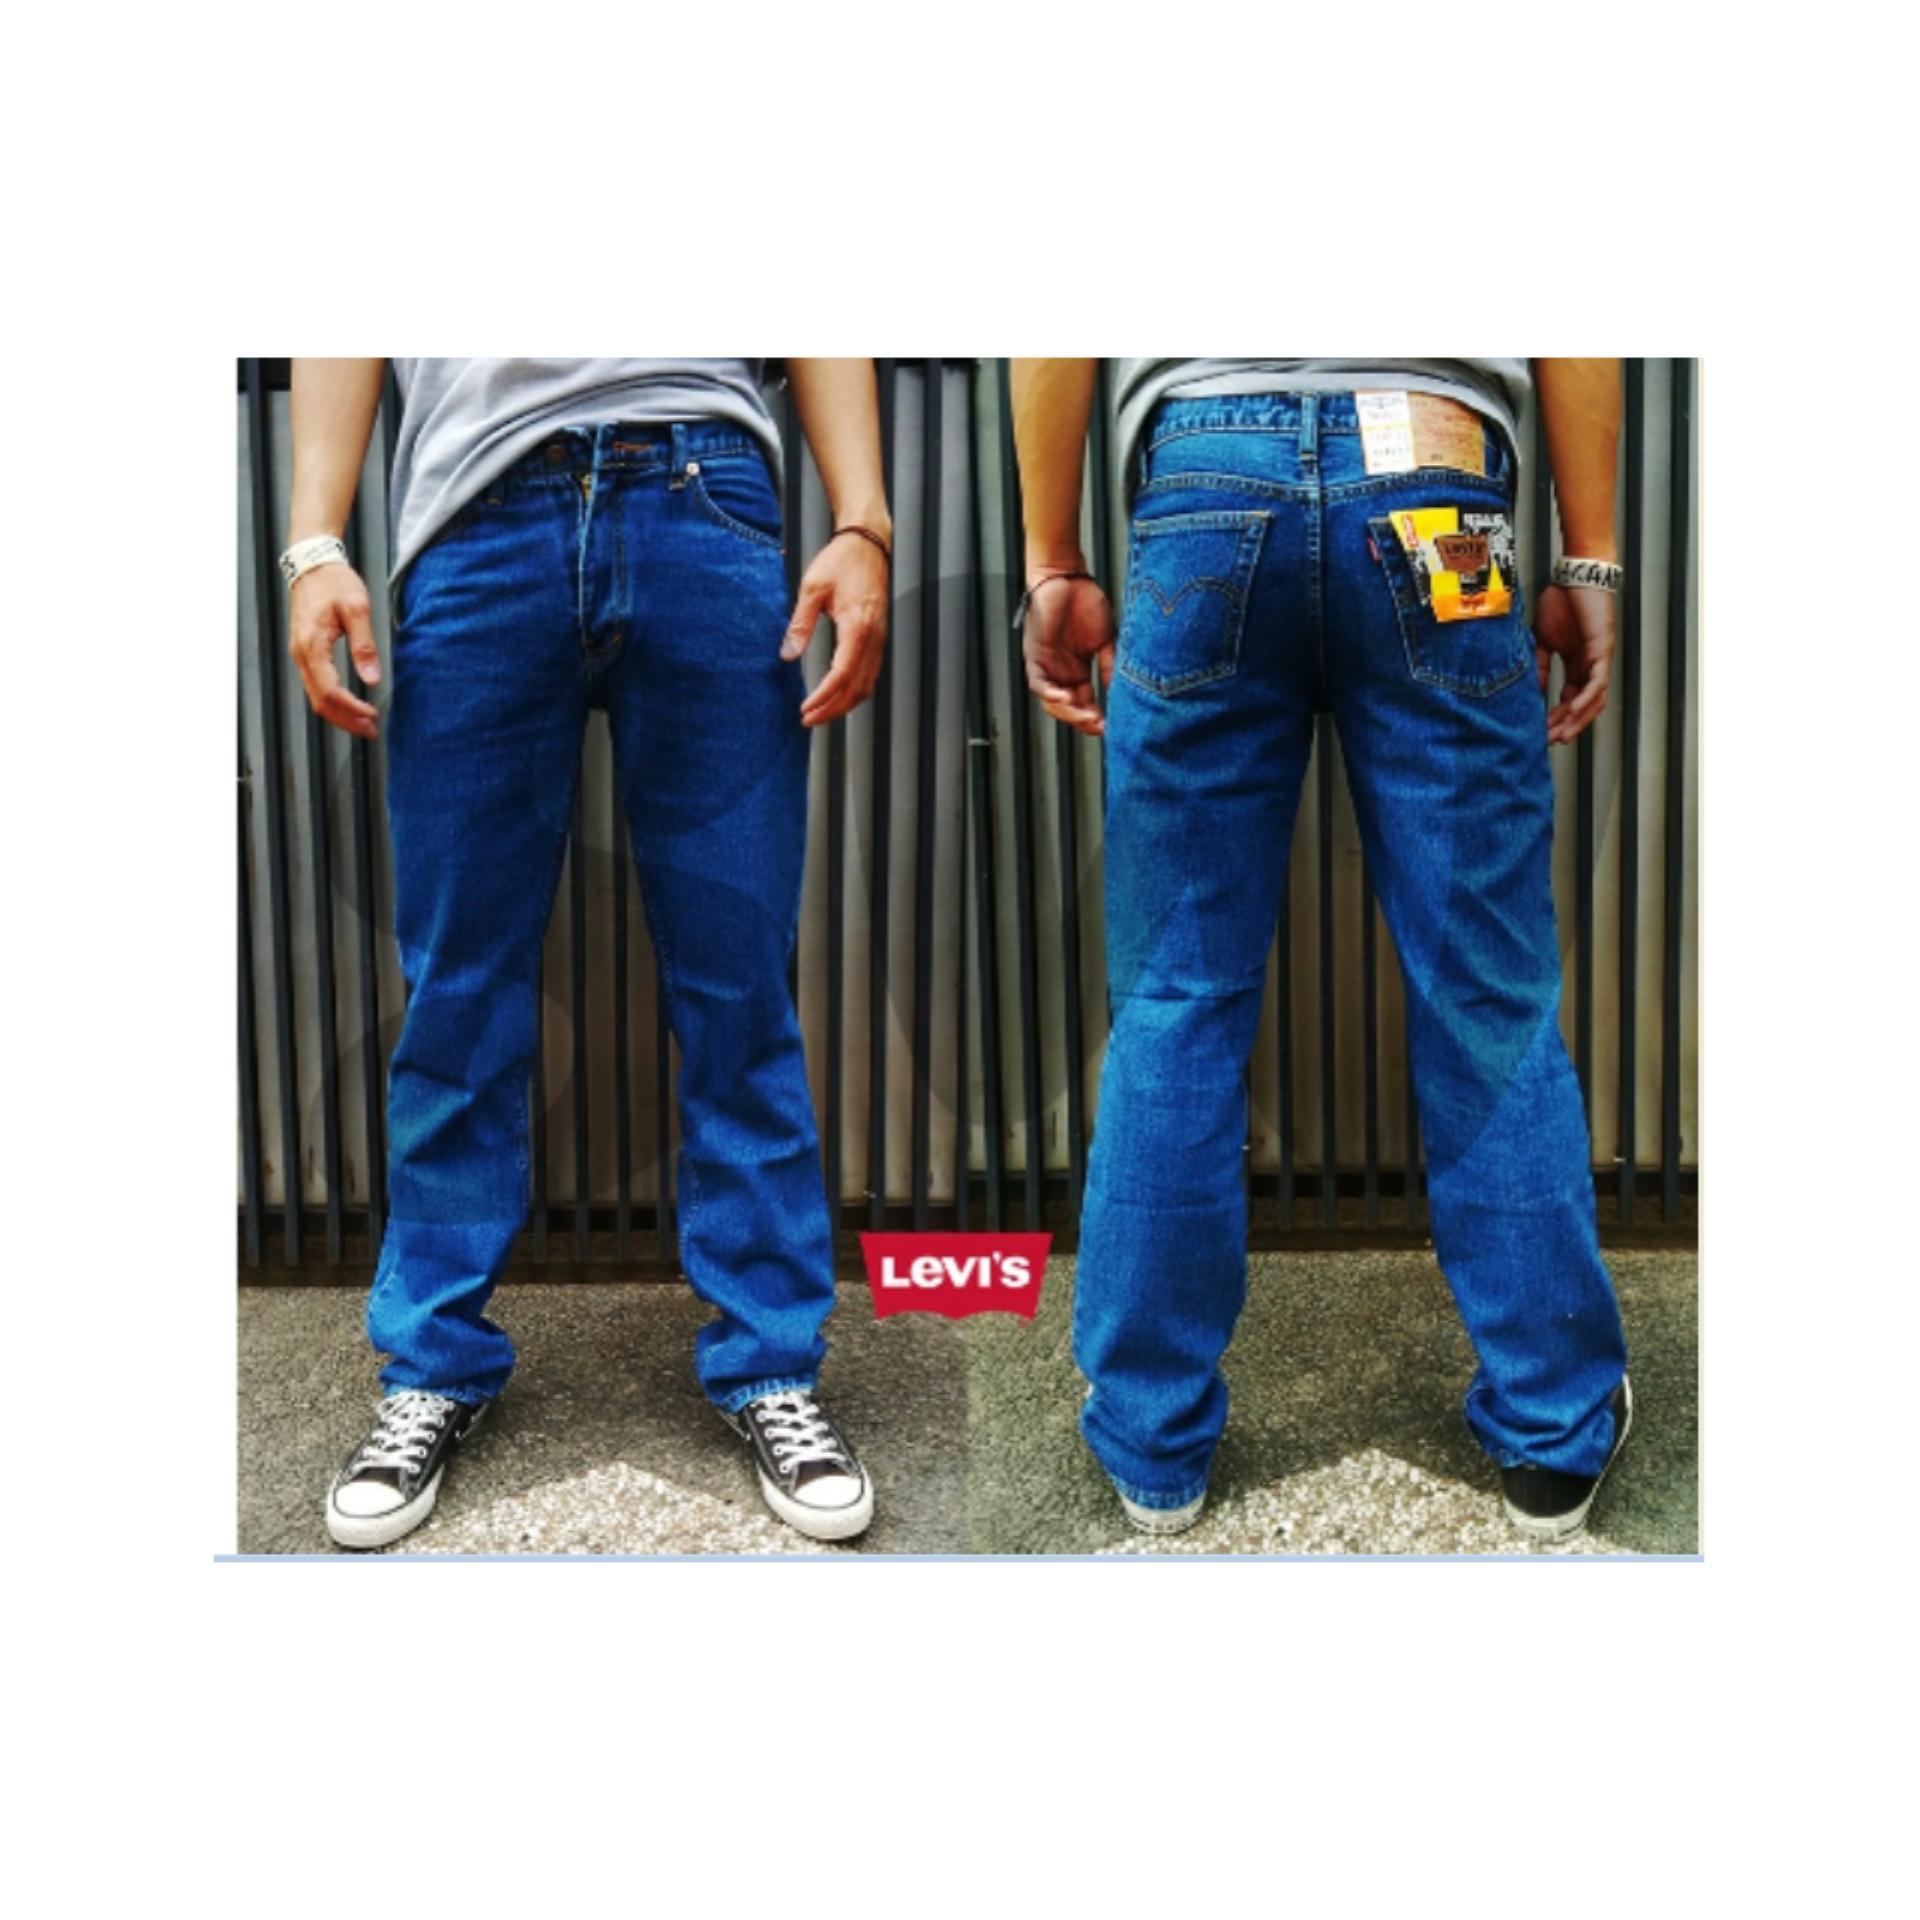 Online Murah Celana Levis Jeans Biowash Bio Wash Biru Tua Standar Fashion Panjang Keren